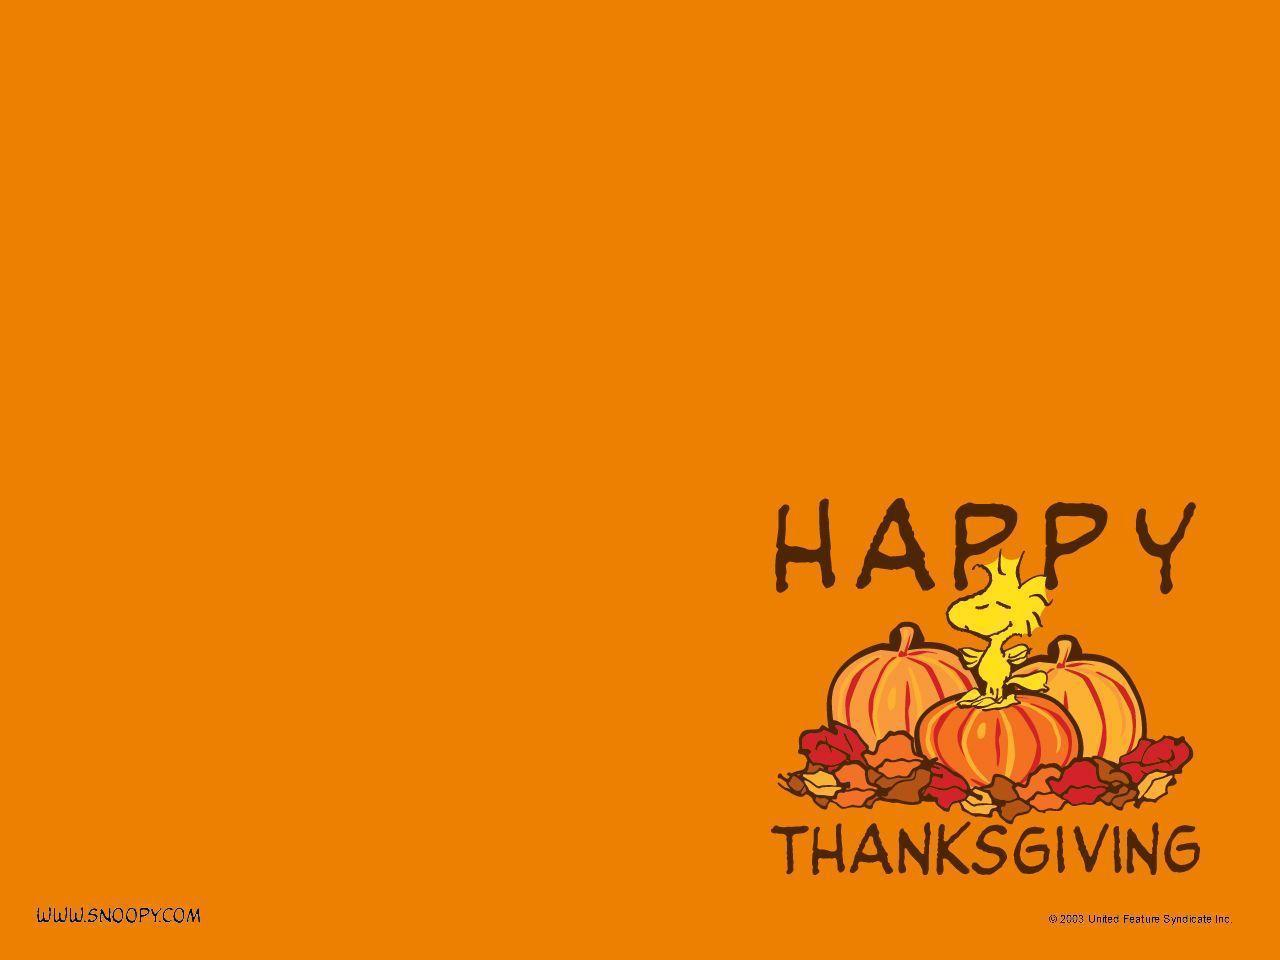 Thanksgiving - Peanuts Wallpaper (452774) - Fanpop